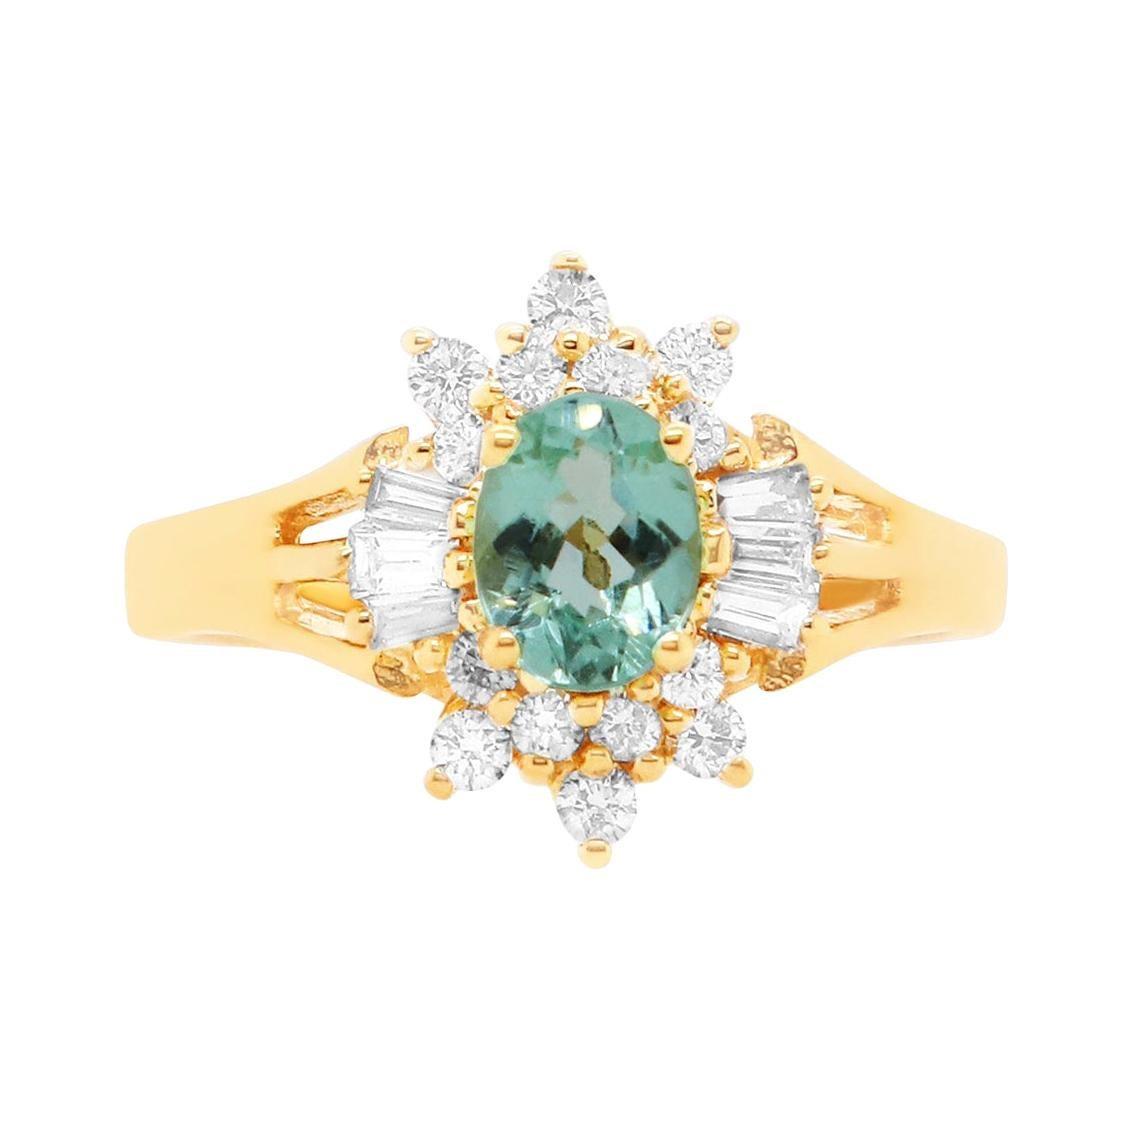 Oval Paraiba Tourmaline Baguette Diamond Fancy Engagement Ring Yellow Gold 14K